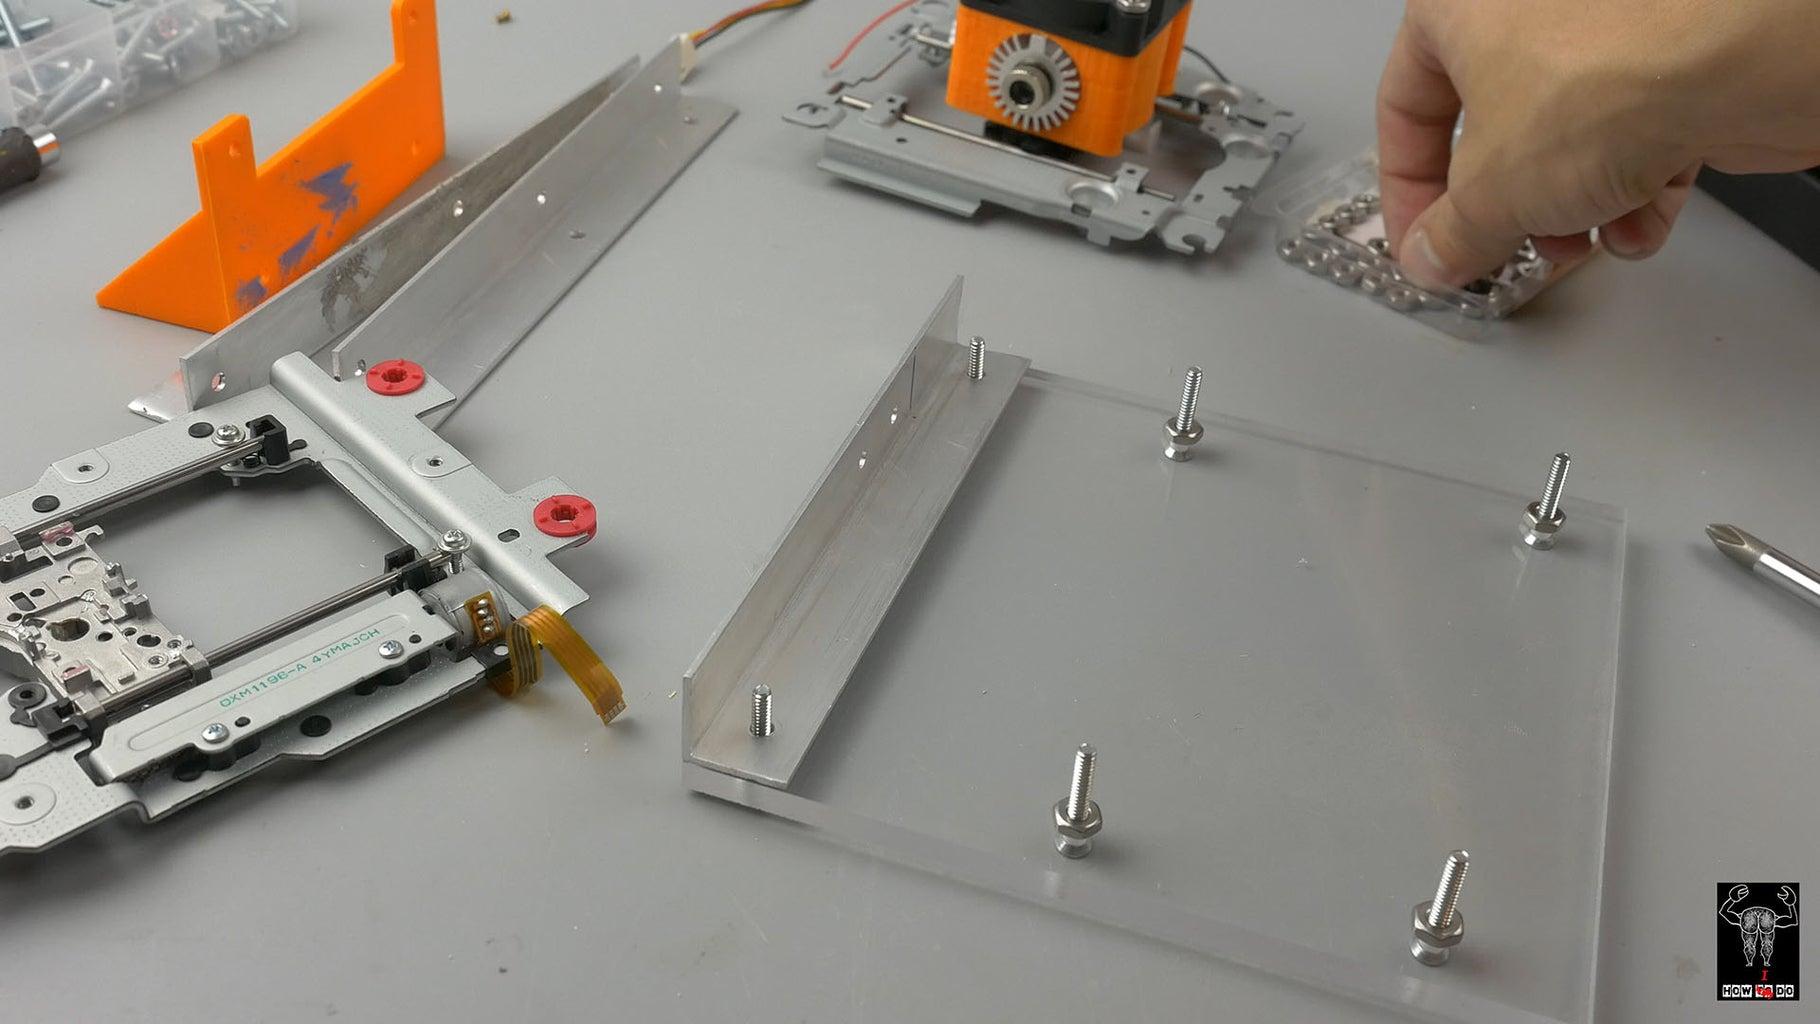 Assembling the Base